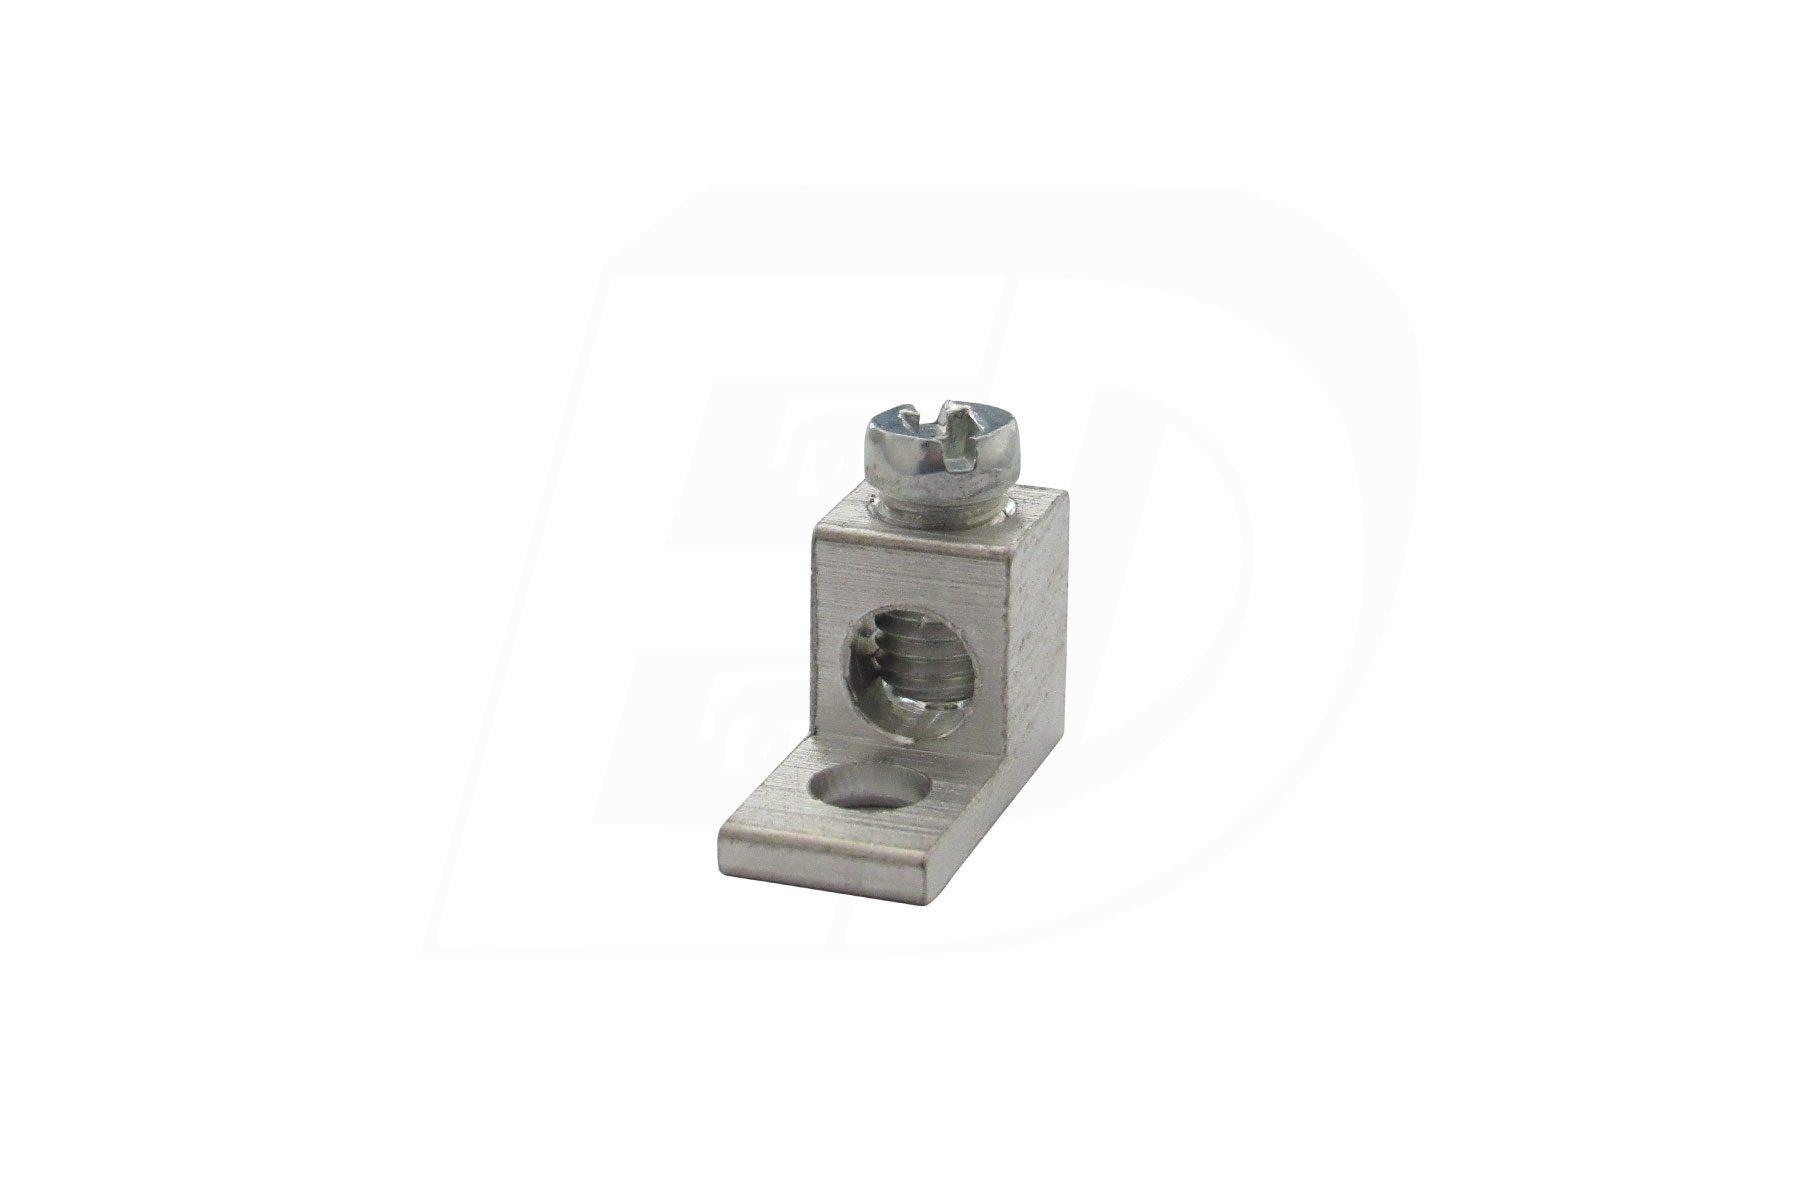 Solderless Aluminum Mechanical Lug